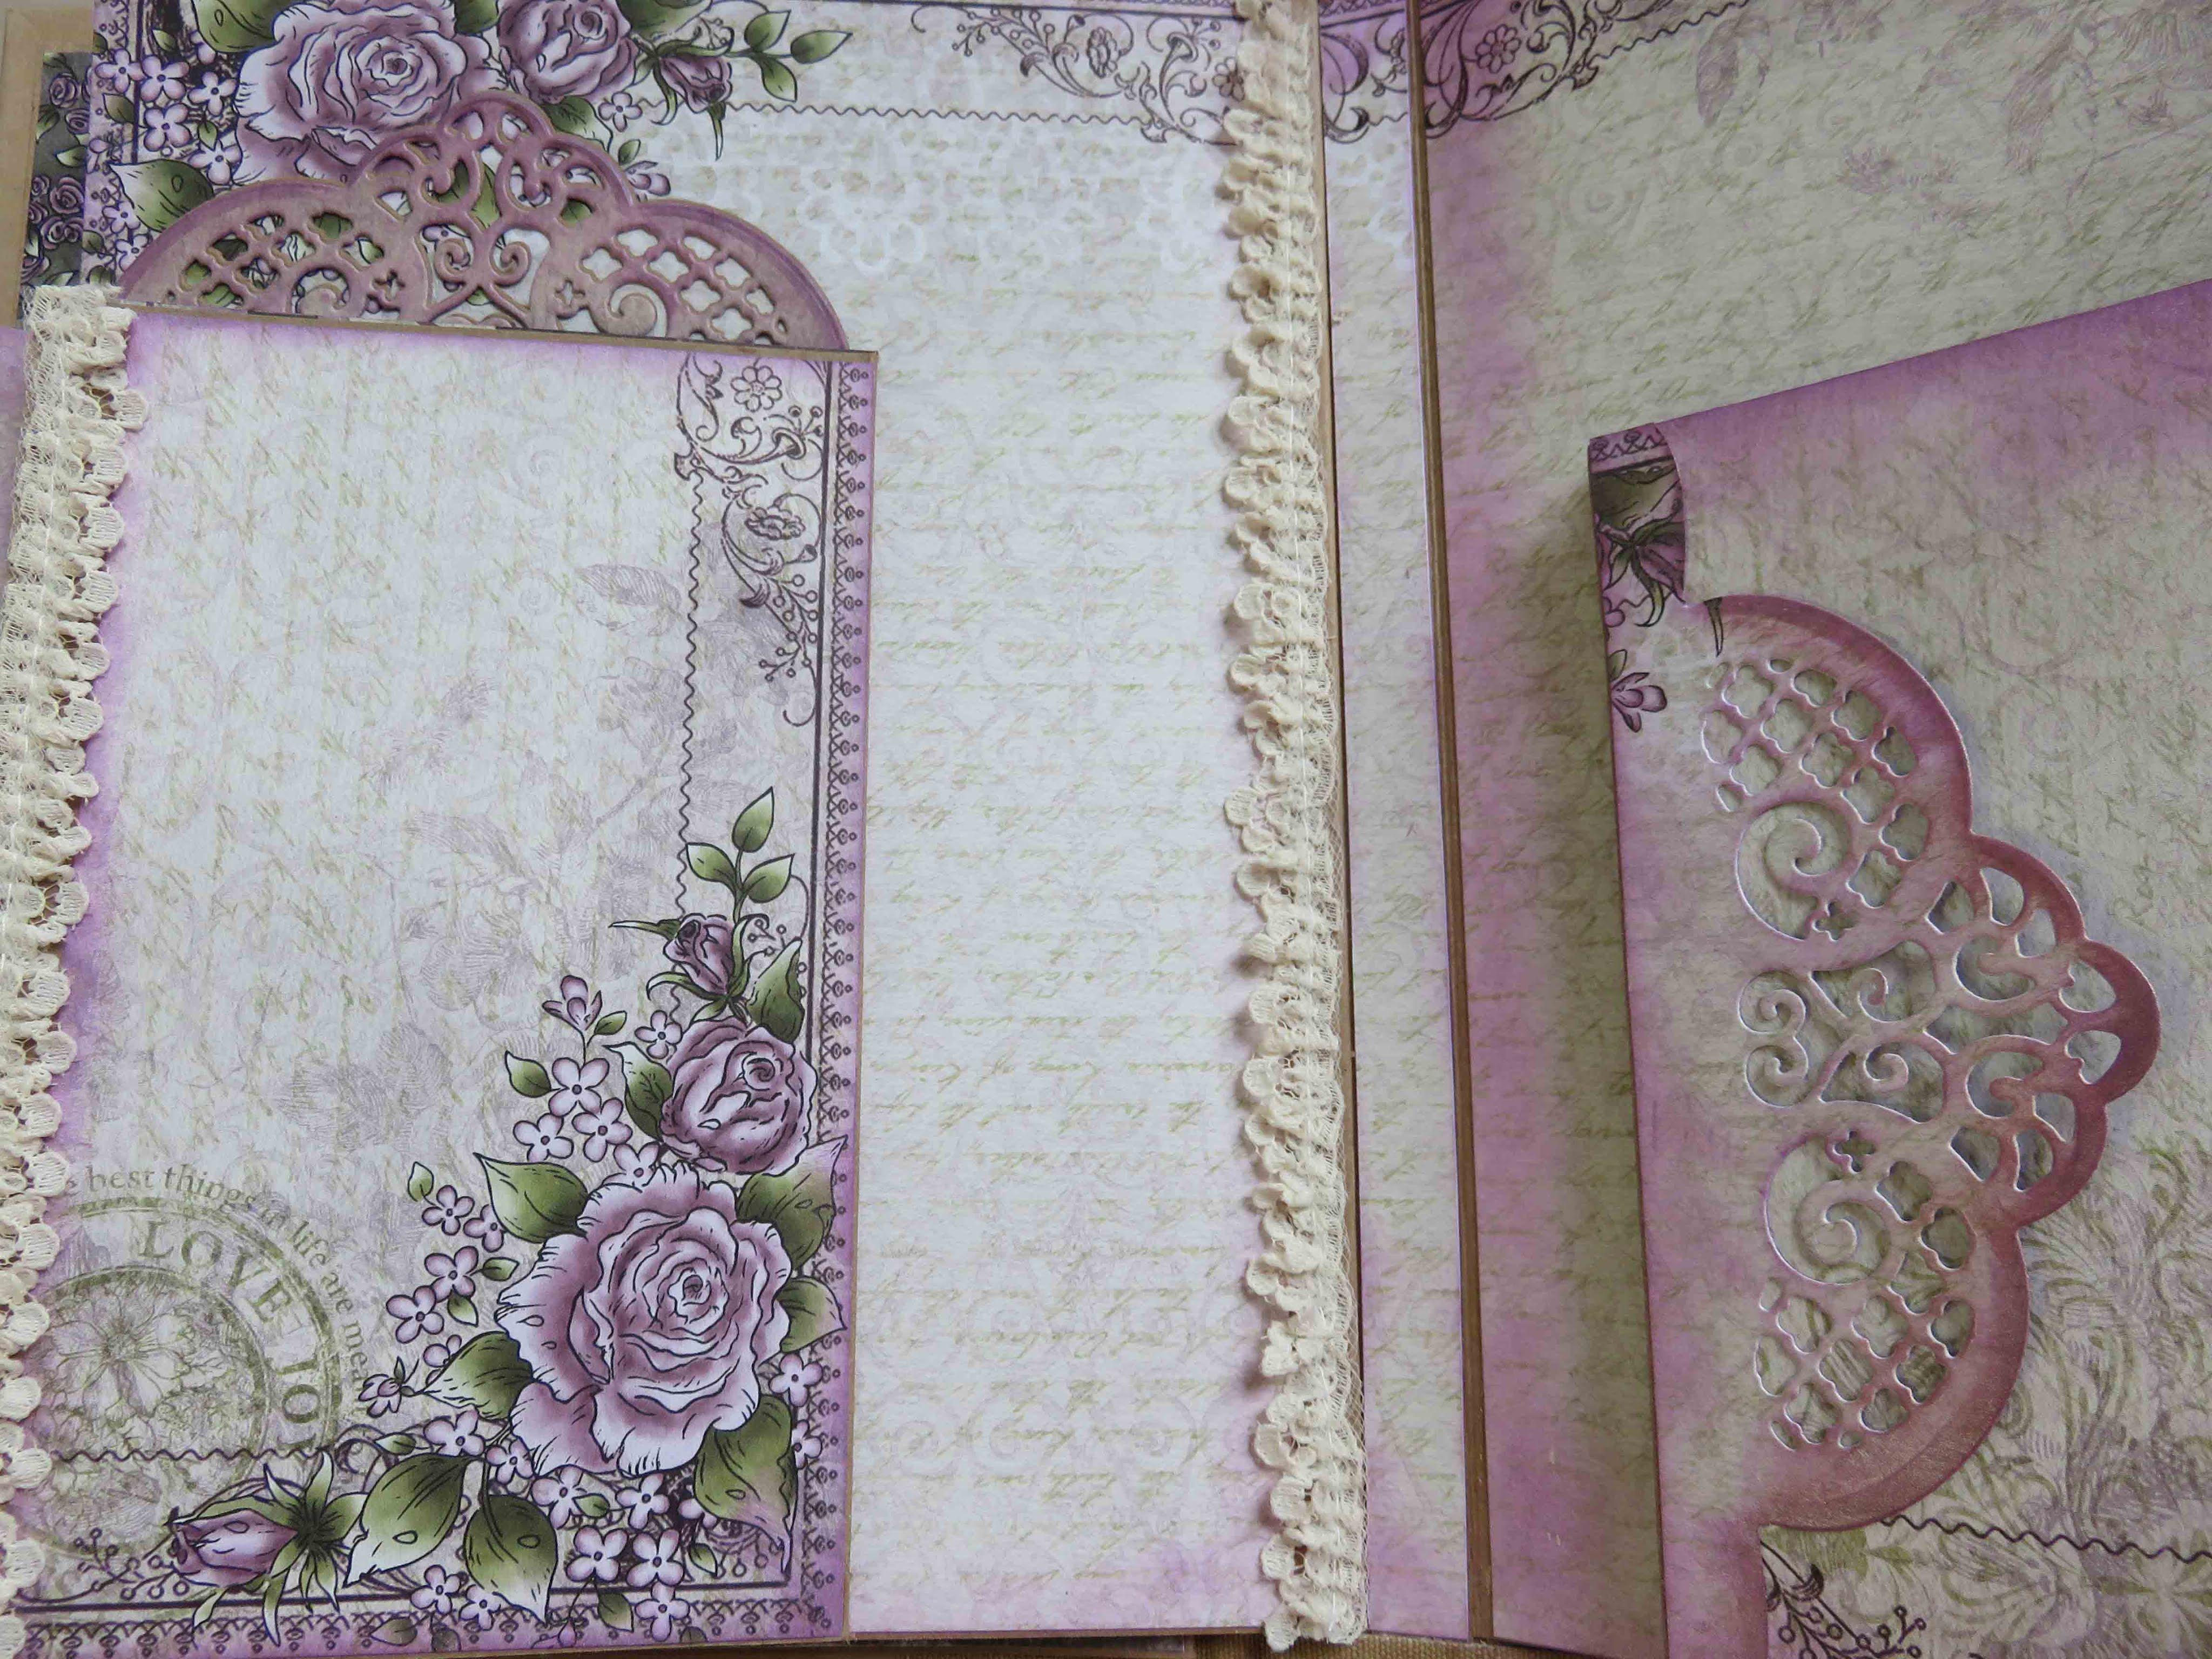 Heartfelt Creations Tutorial Pt3Album and Inserts using Raindrops on Roses paper